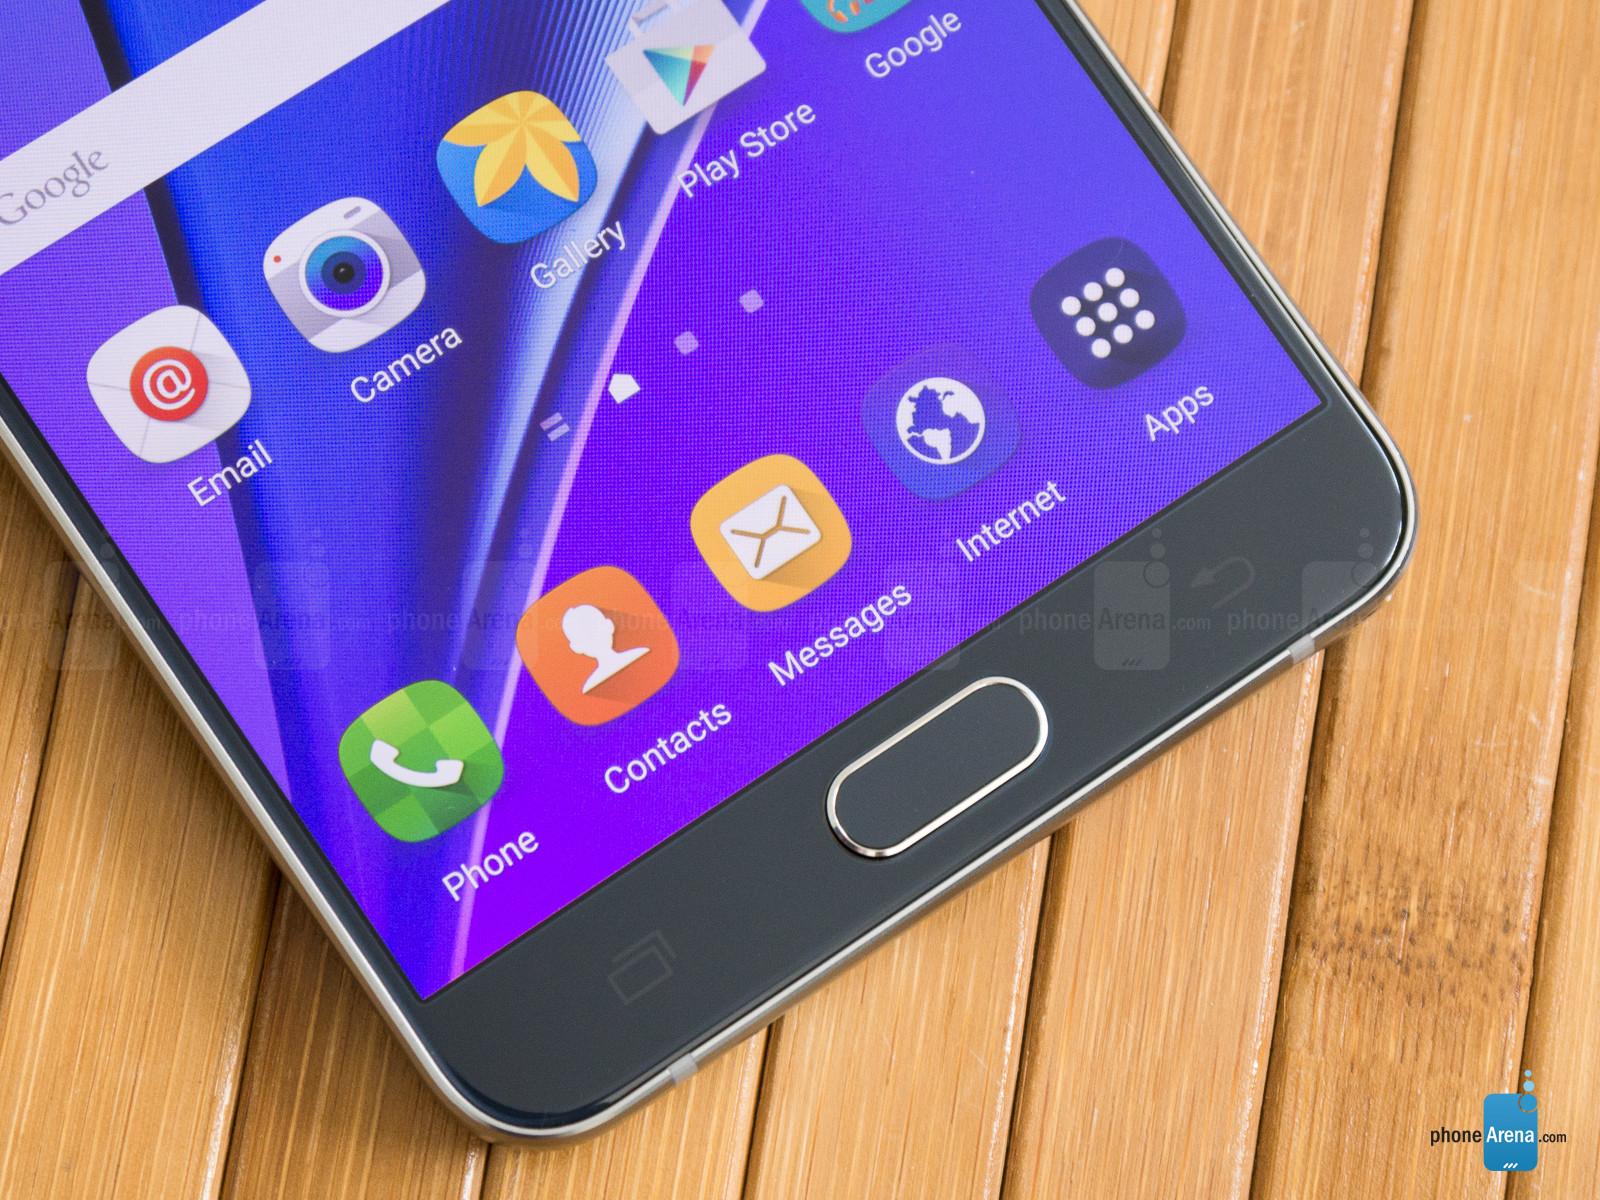 Galaxy S7 با سه صفحه نمایش متفاوت